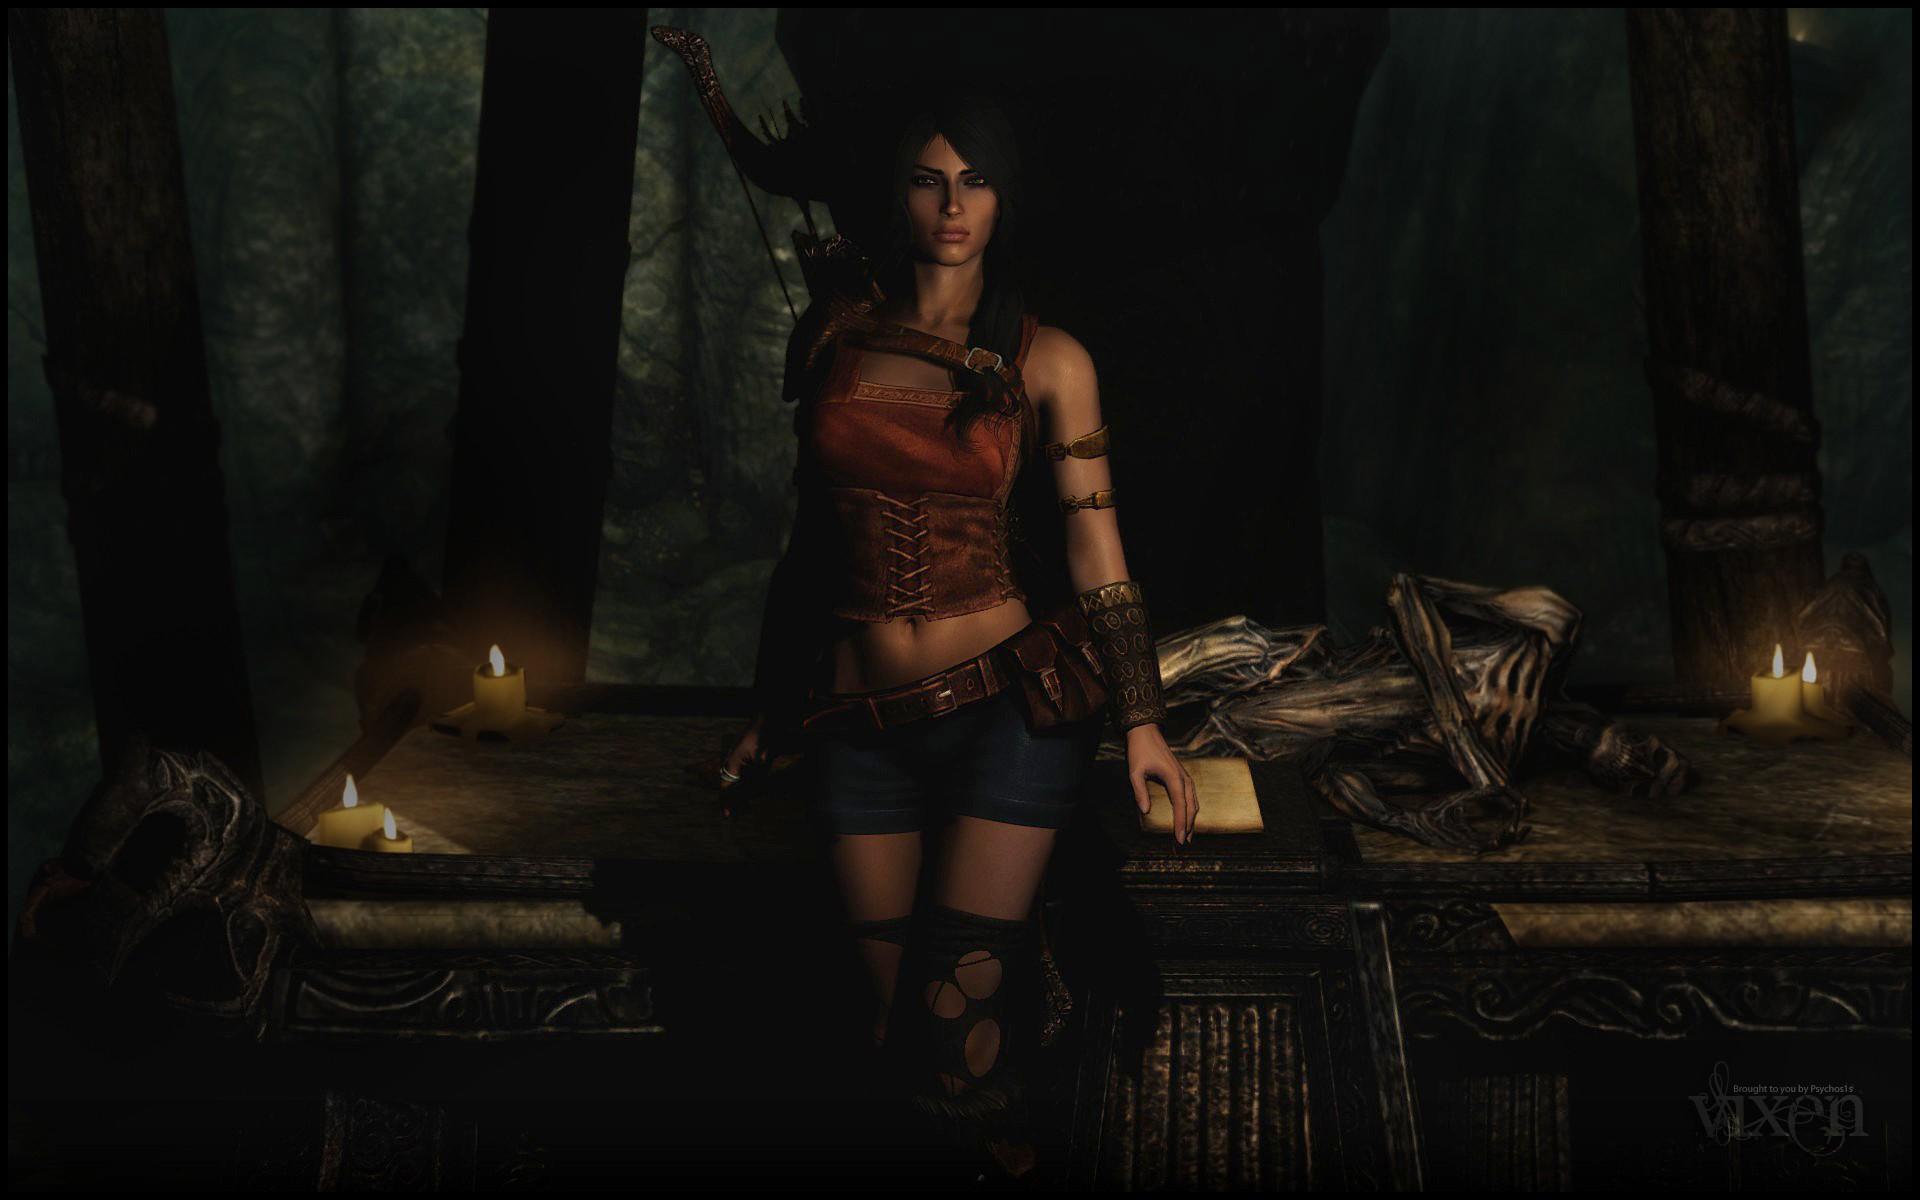 1233 The Elder Scrolls V: Skyrim HD Wallpapers | Backgrounds ...